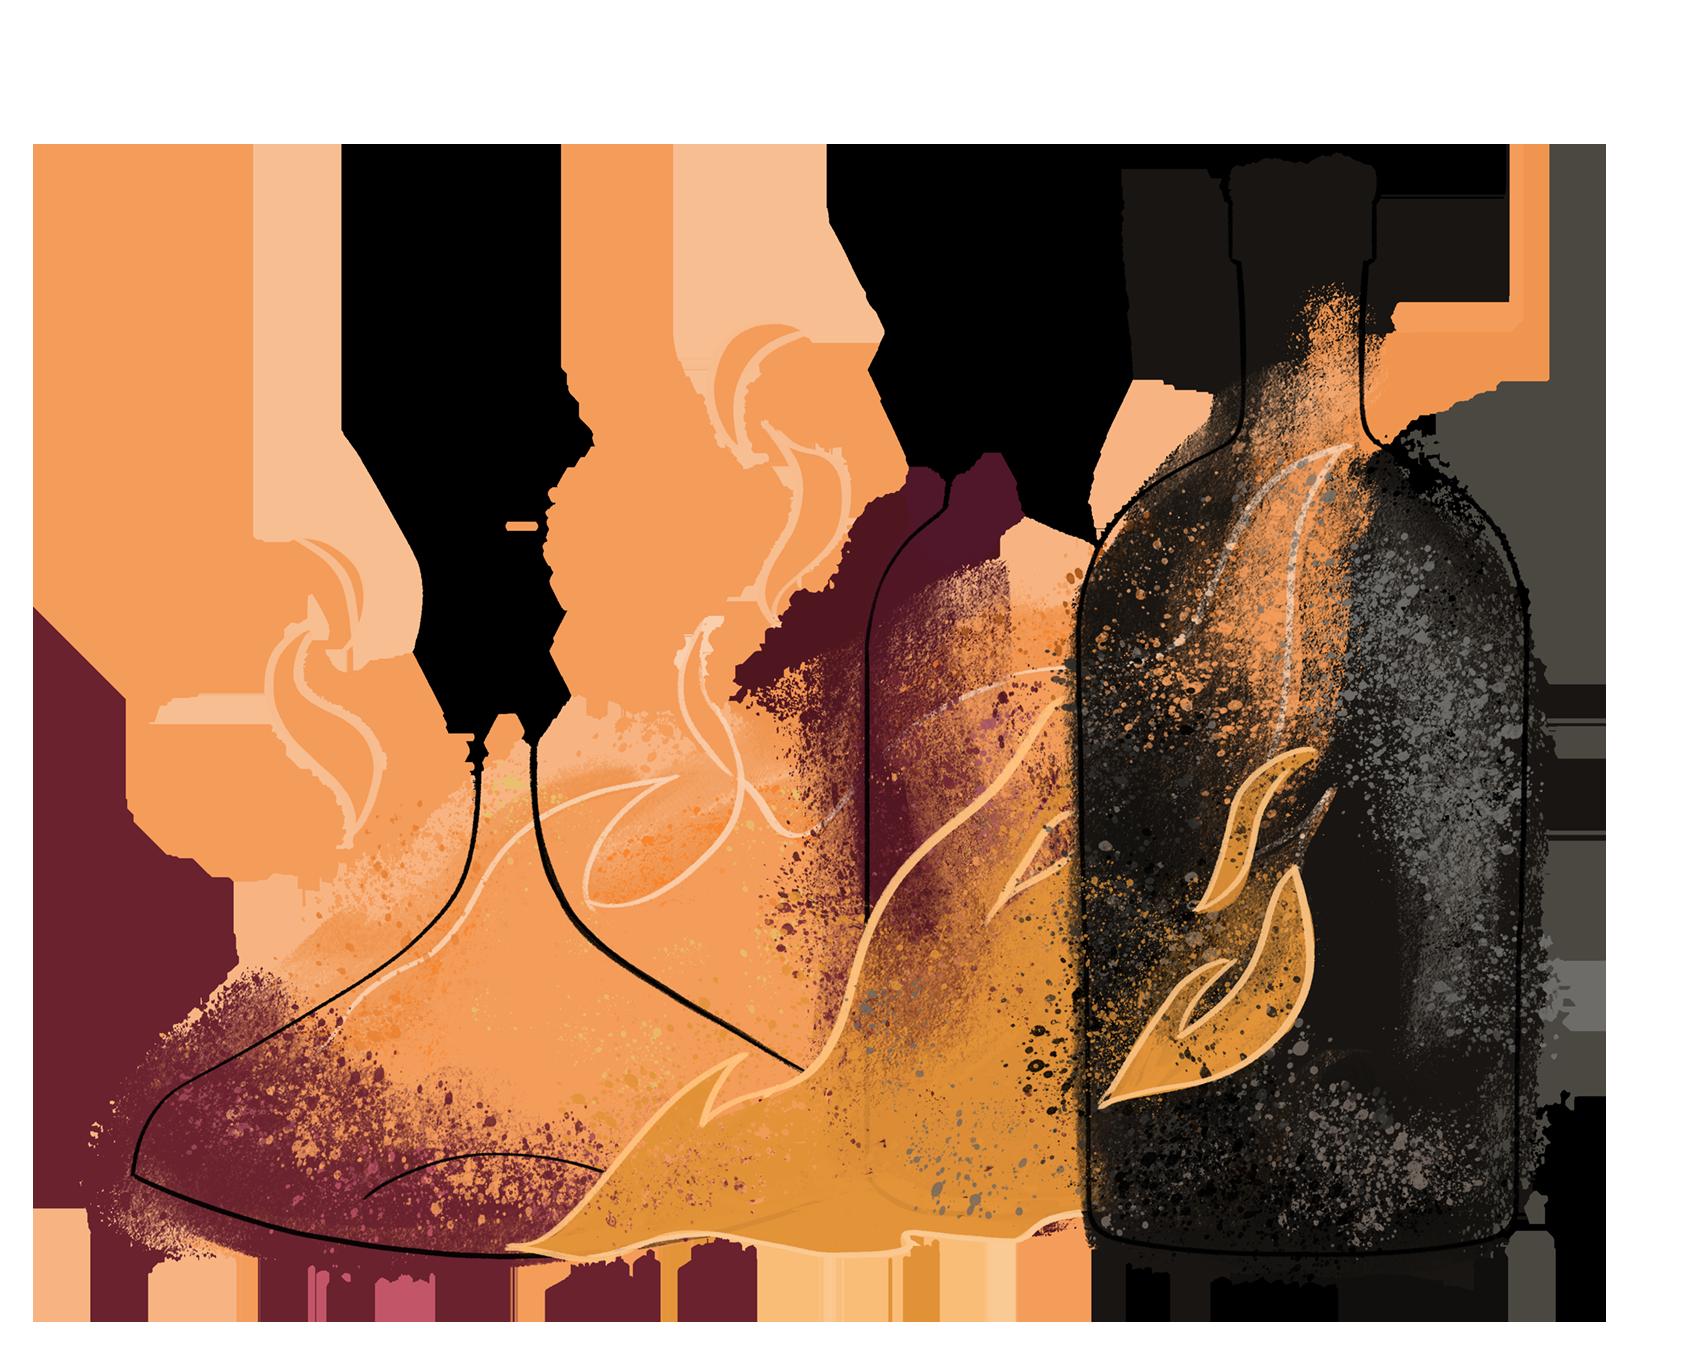 10 - starka viner, starka smaker